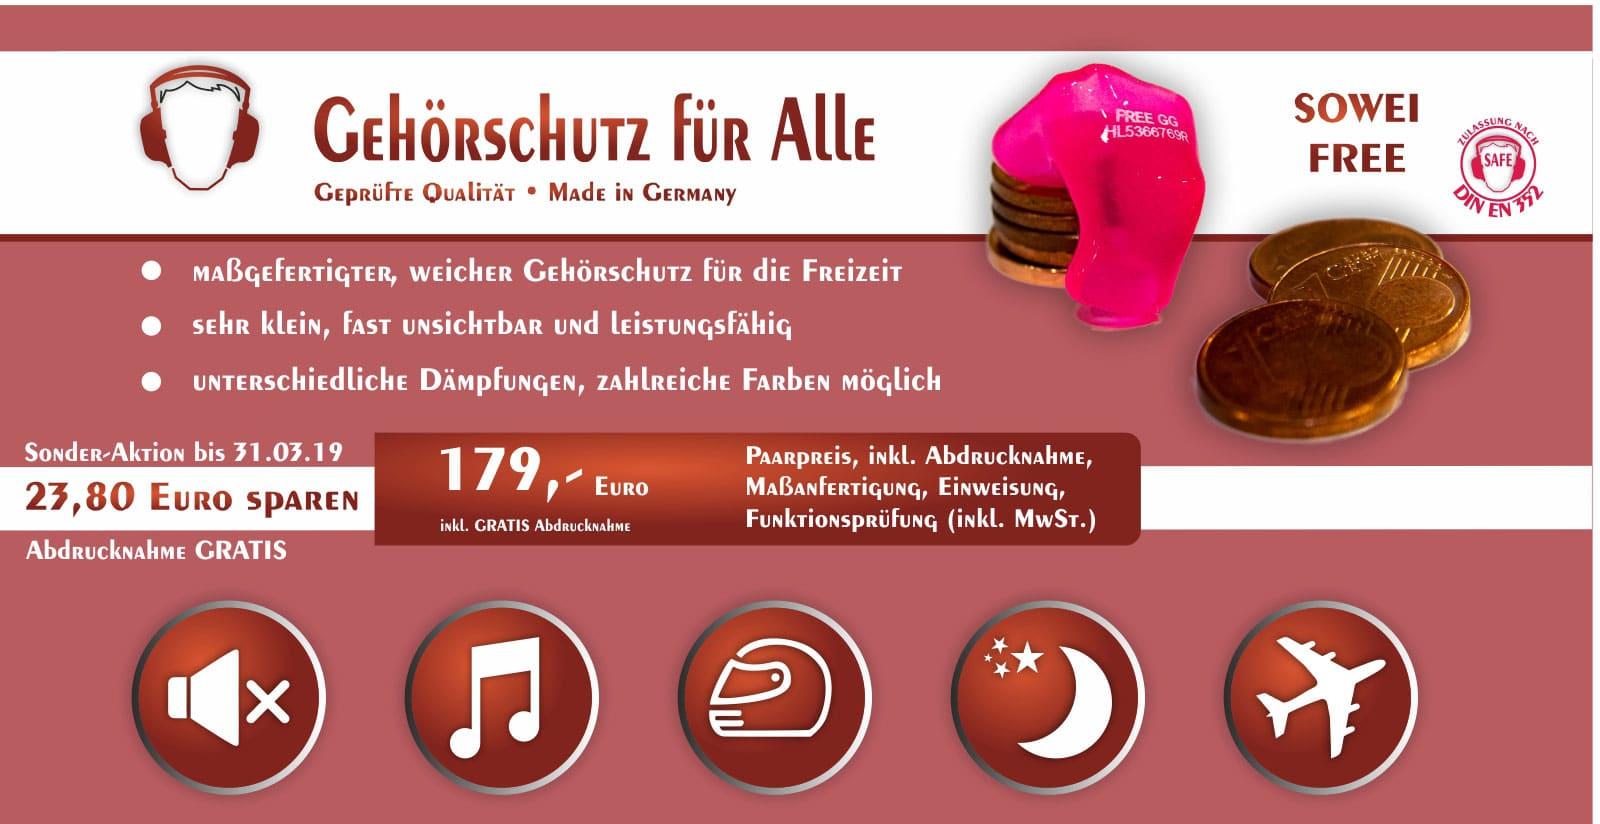 SOWEI free Gehörschutz Hörluchs - Gisbrecht Hörakustik Saarland - Aktionsangebot 2019